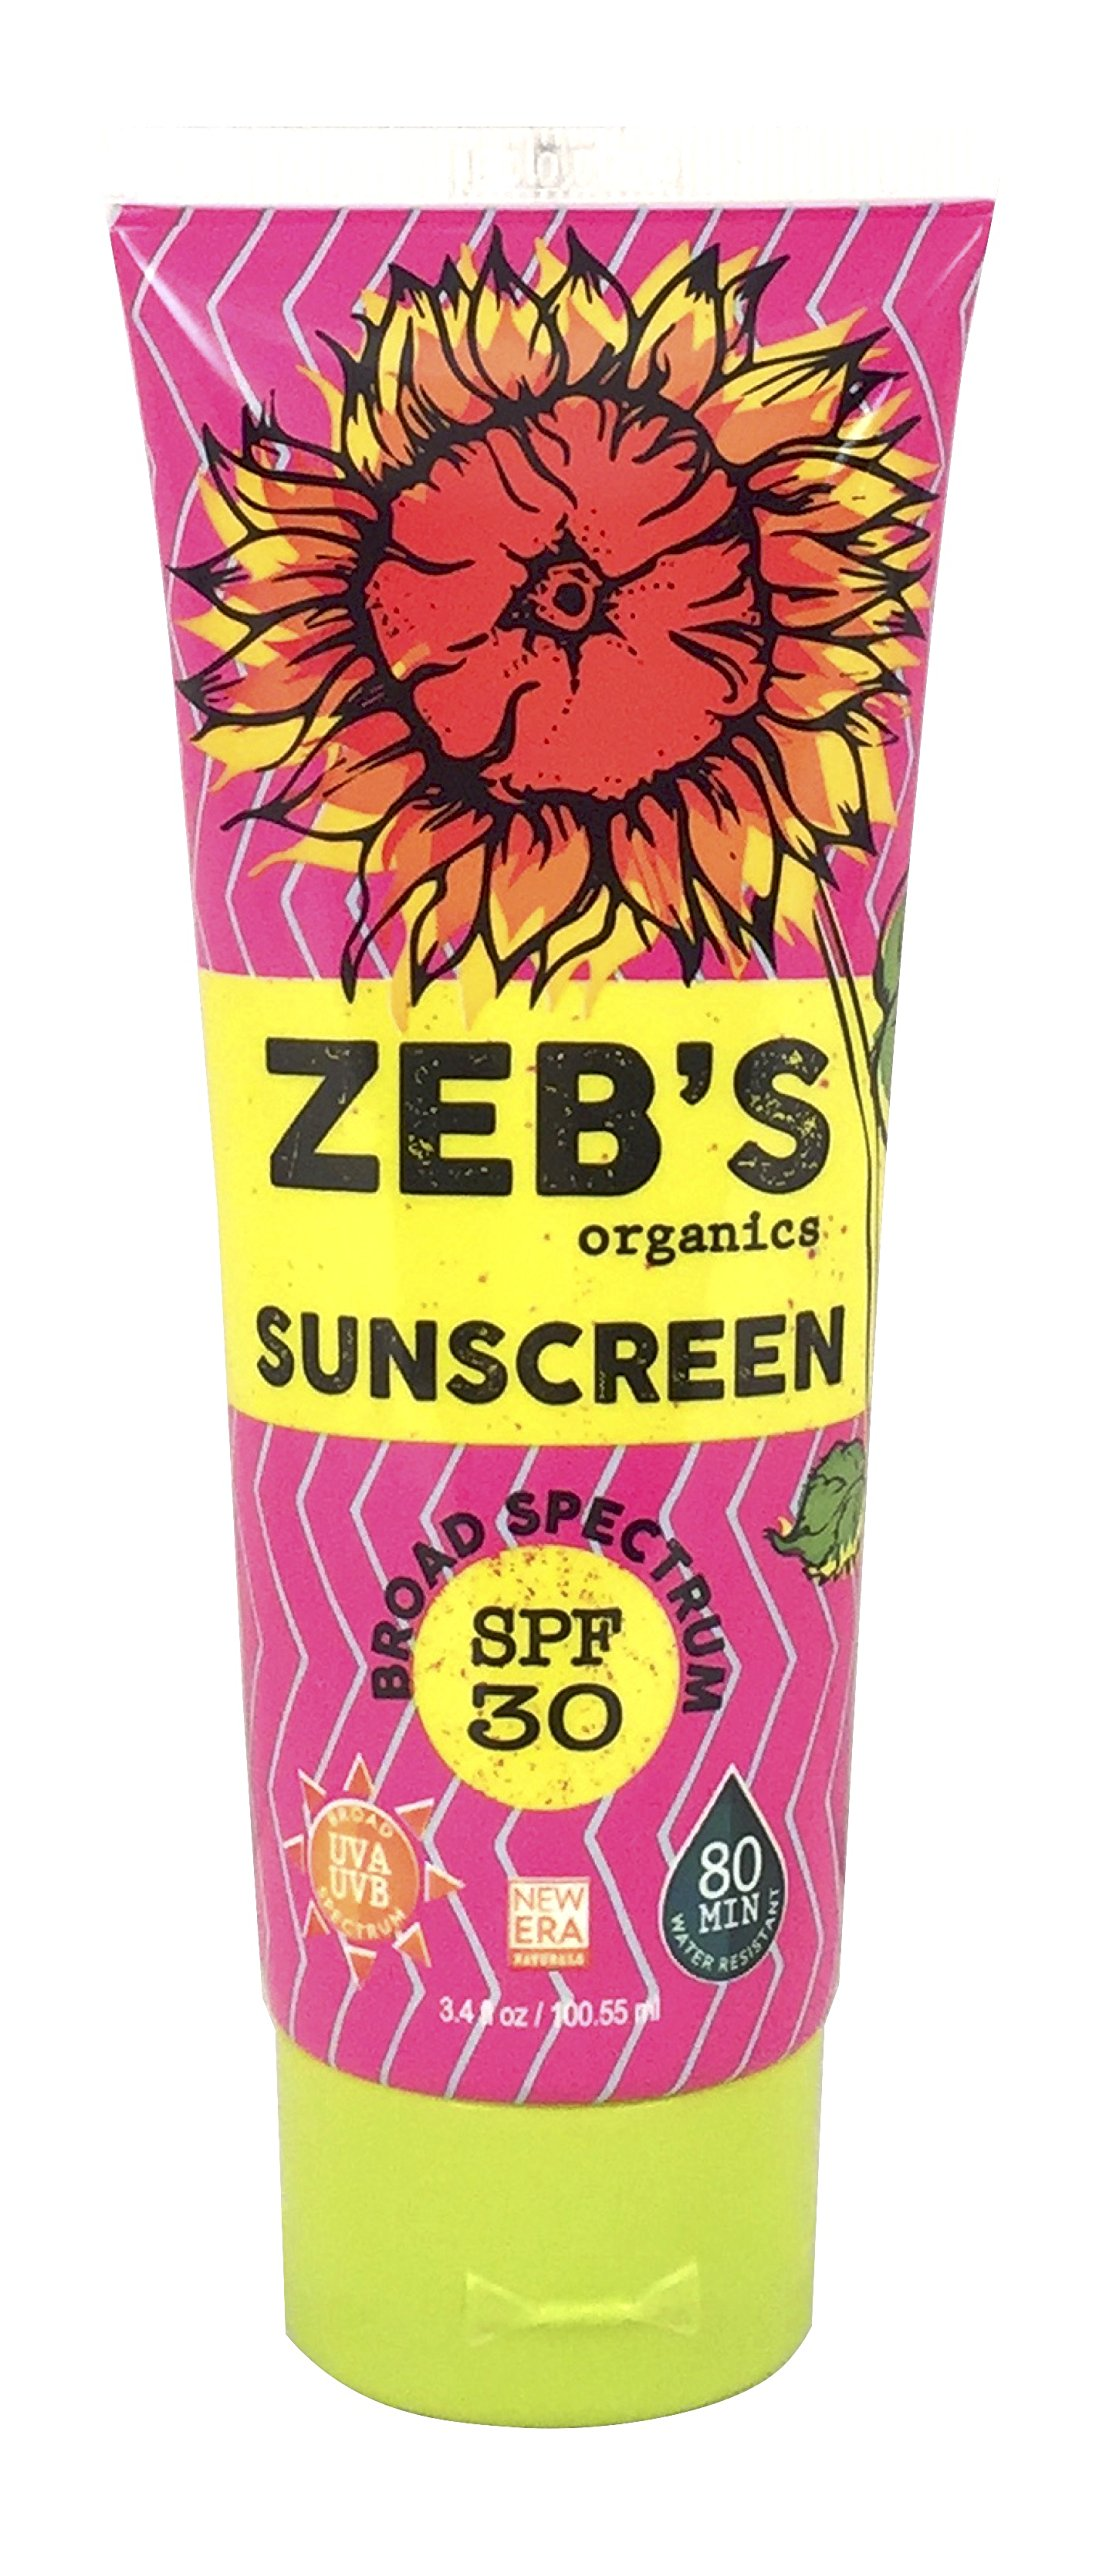 Zebs Organics Sunscreen, Natural & Organic, SPF 30, 3.4oz